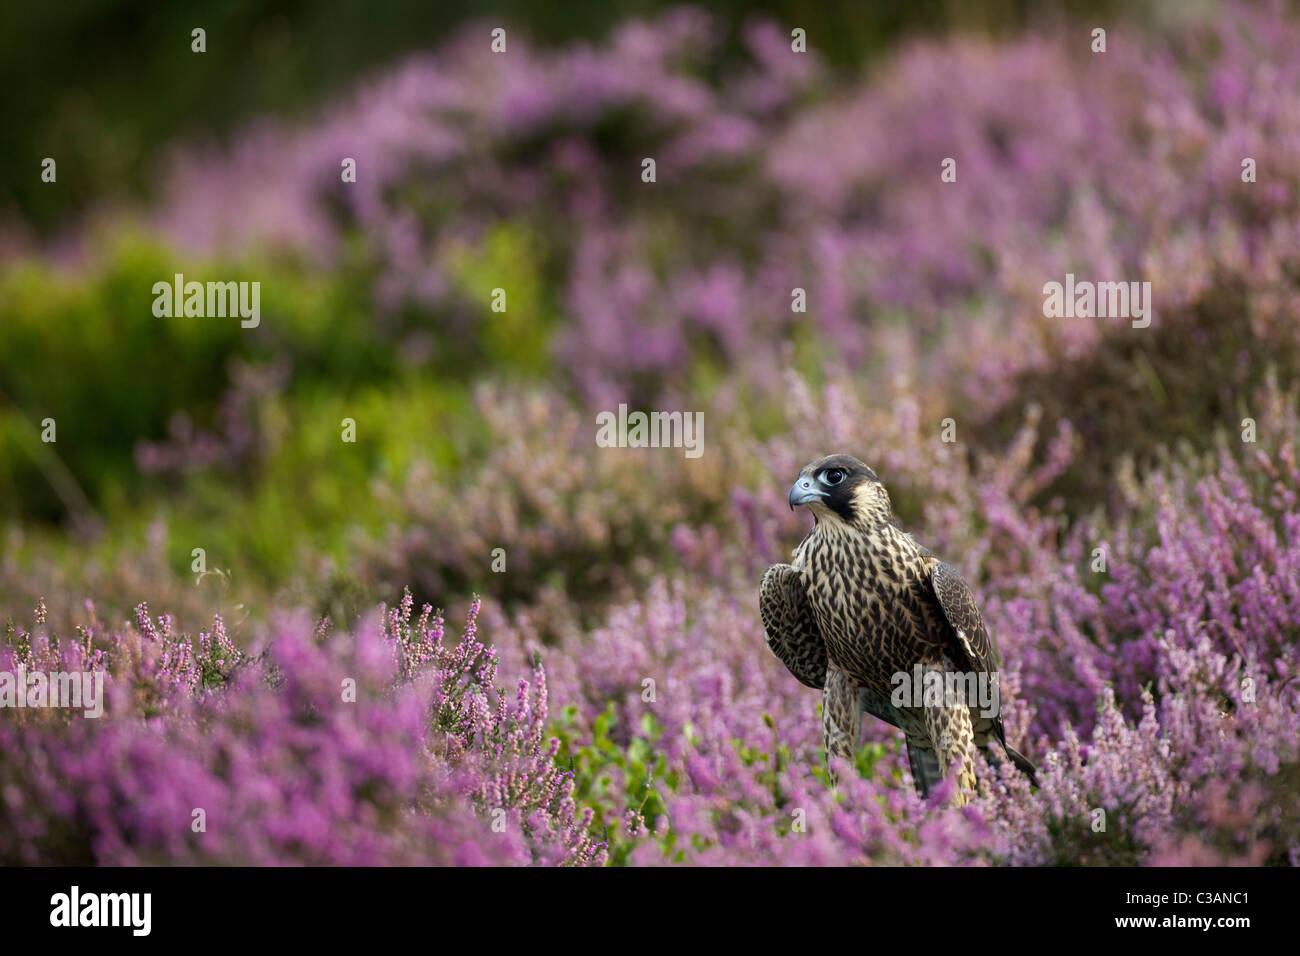 Peregrine Falcon, Falco peregrinus, captive, in heather, Leicestershire, England, UK, United Kingdom, GB, - Stock Image